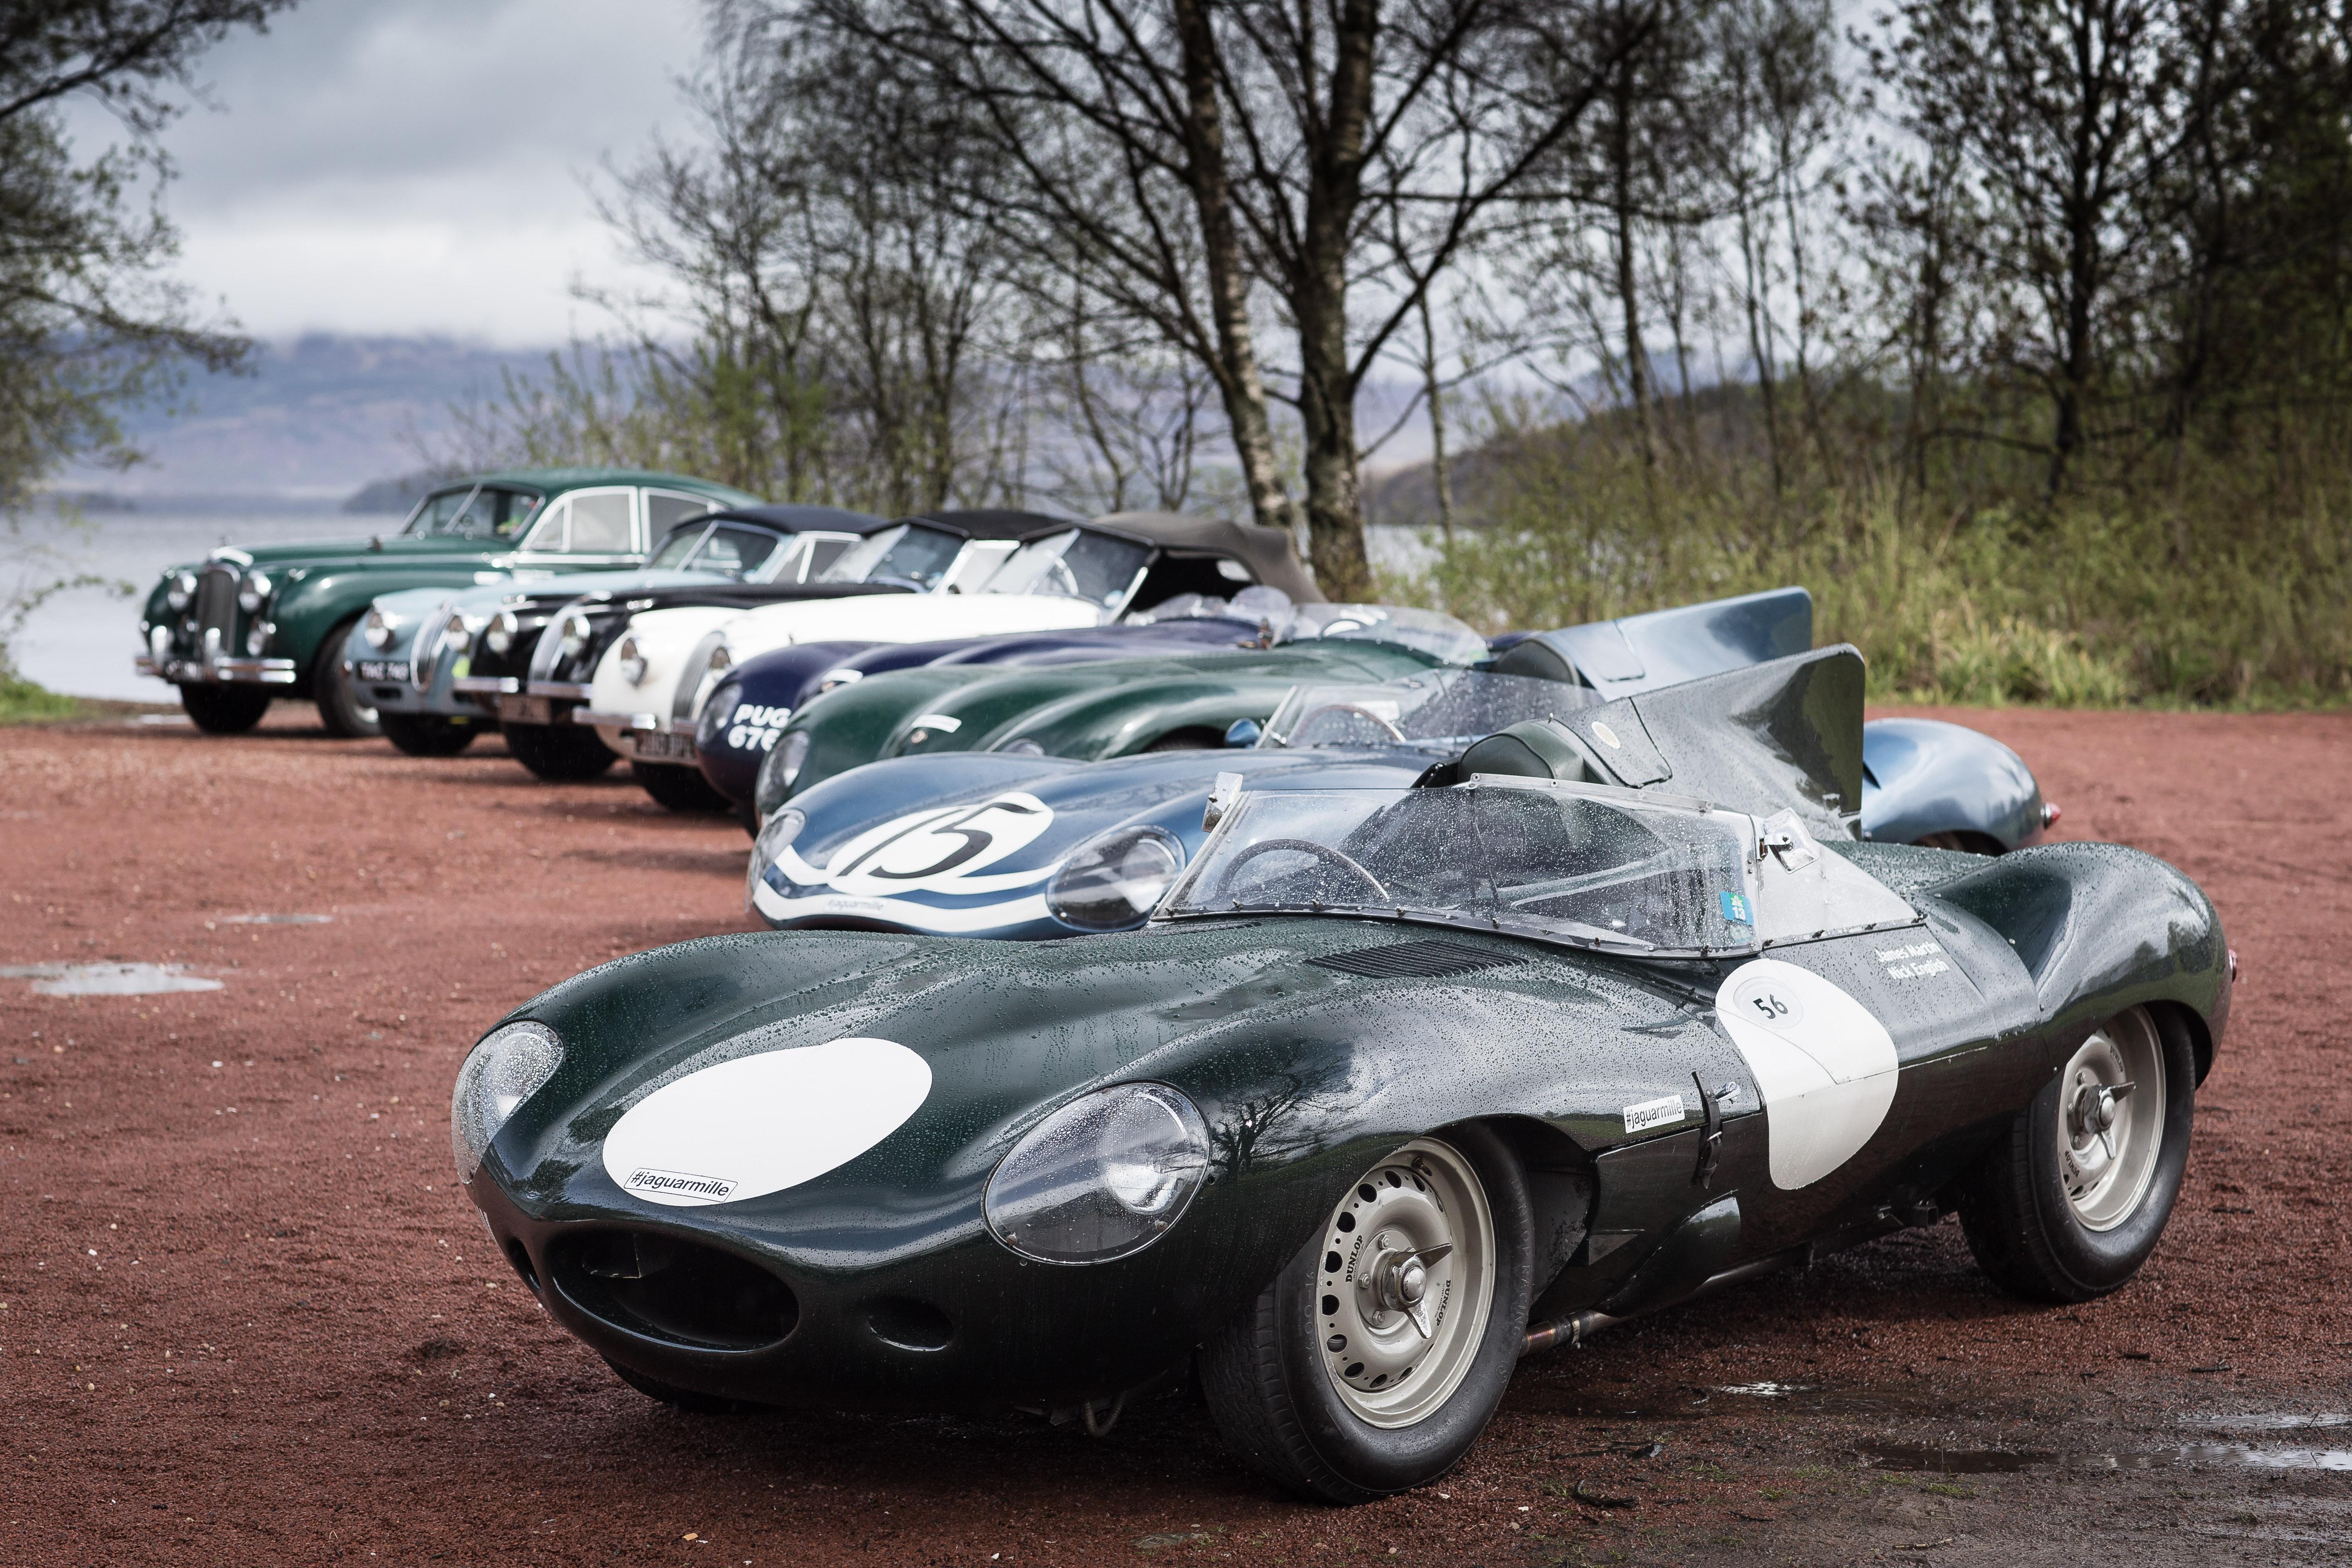 Jaguar Prepares For 2015 Mille Miglia With Scotland Bound